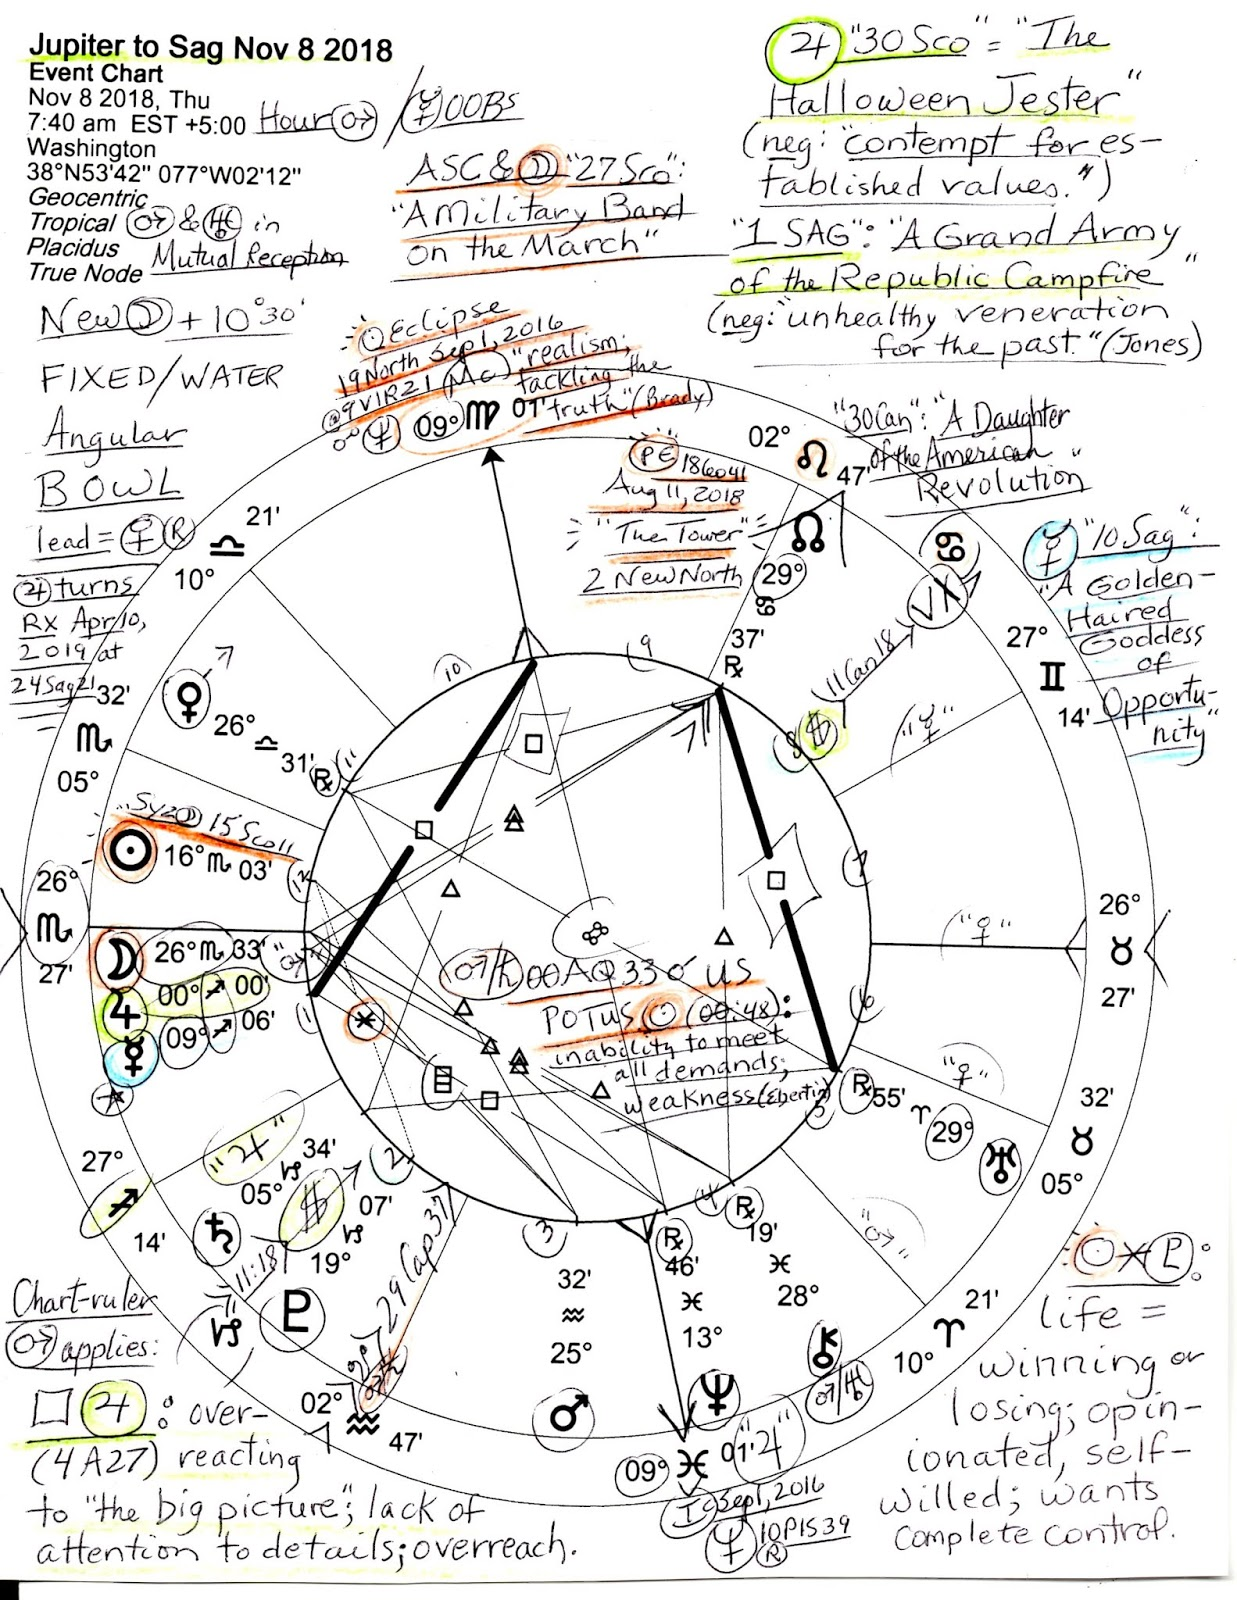 Stars Over Washington Dc Horoscope Nov 8 2018 Jupiter Enters